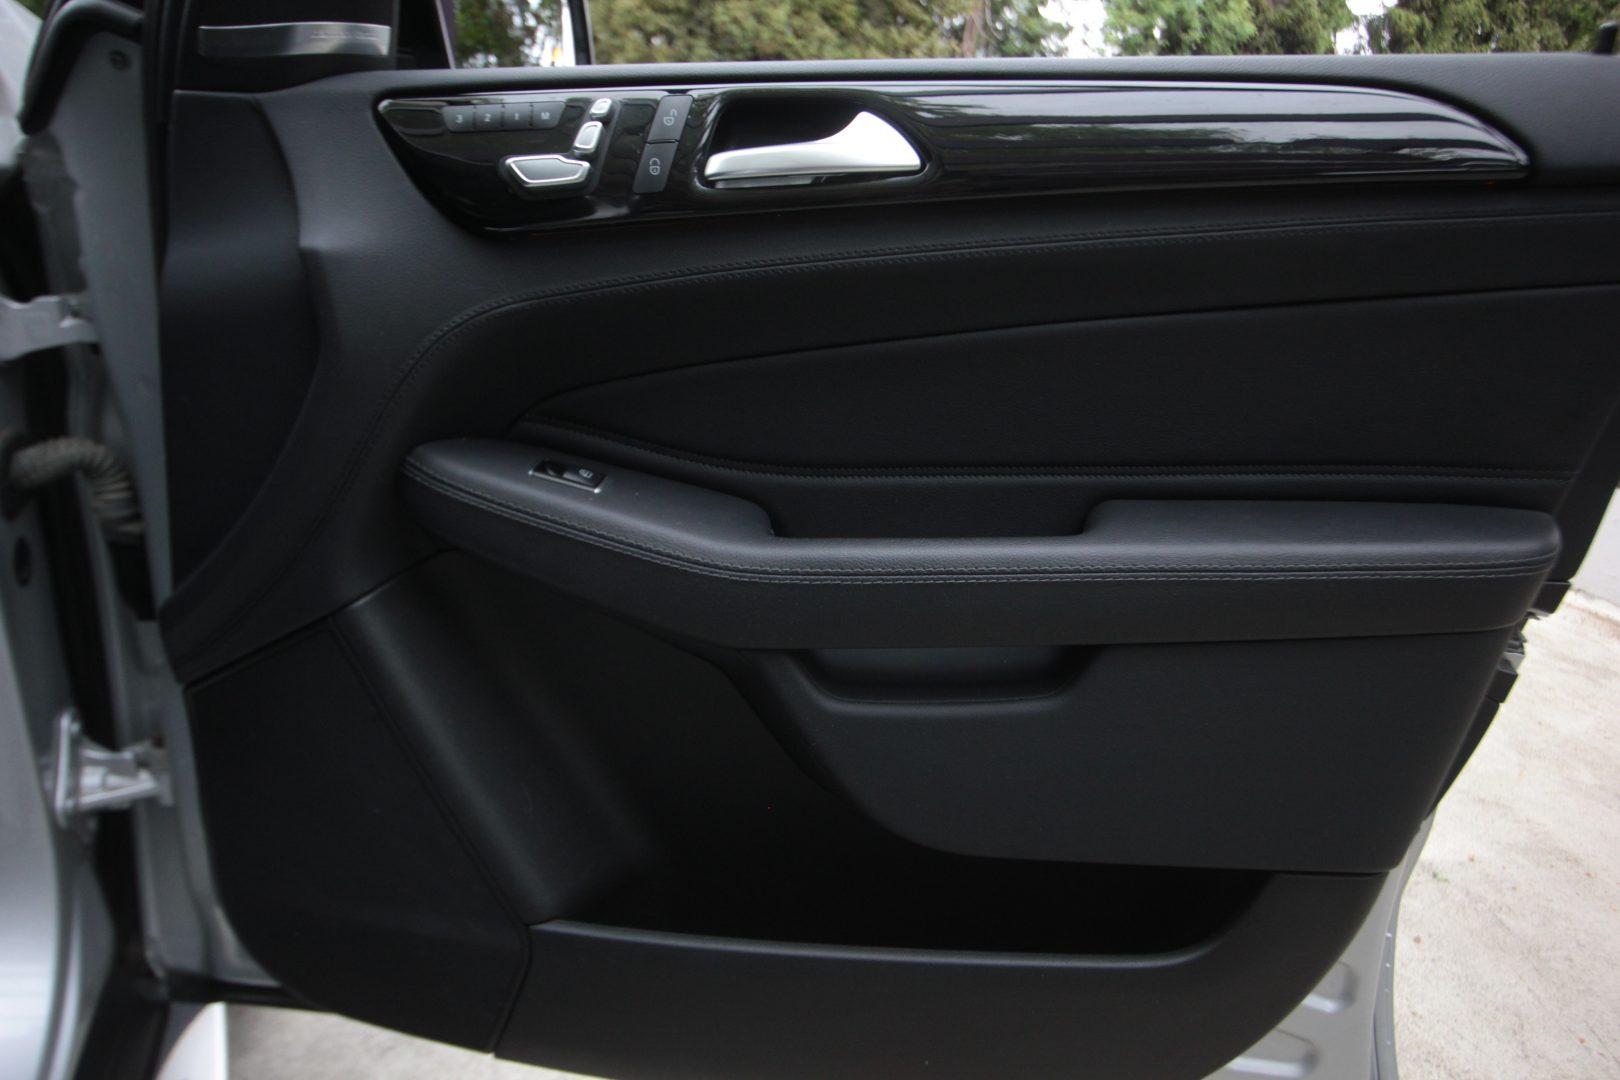 AIL Mercedes-Benz GLE 450 AMG 4Matic 13